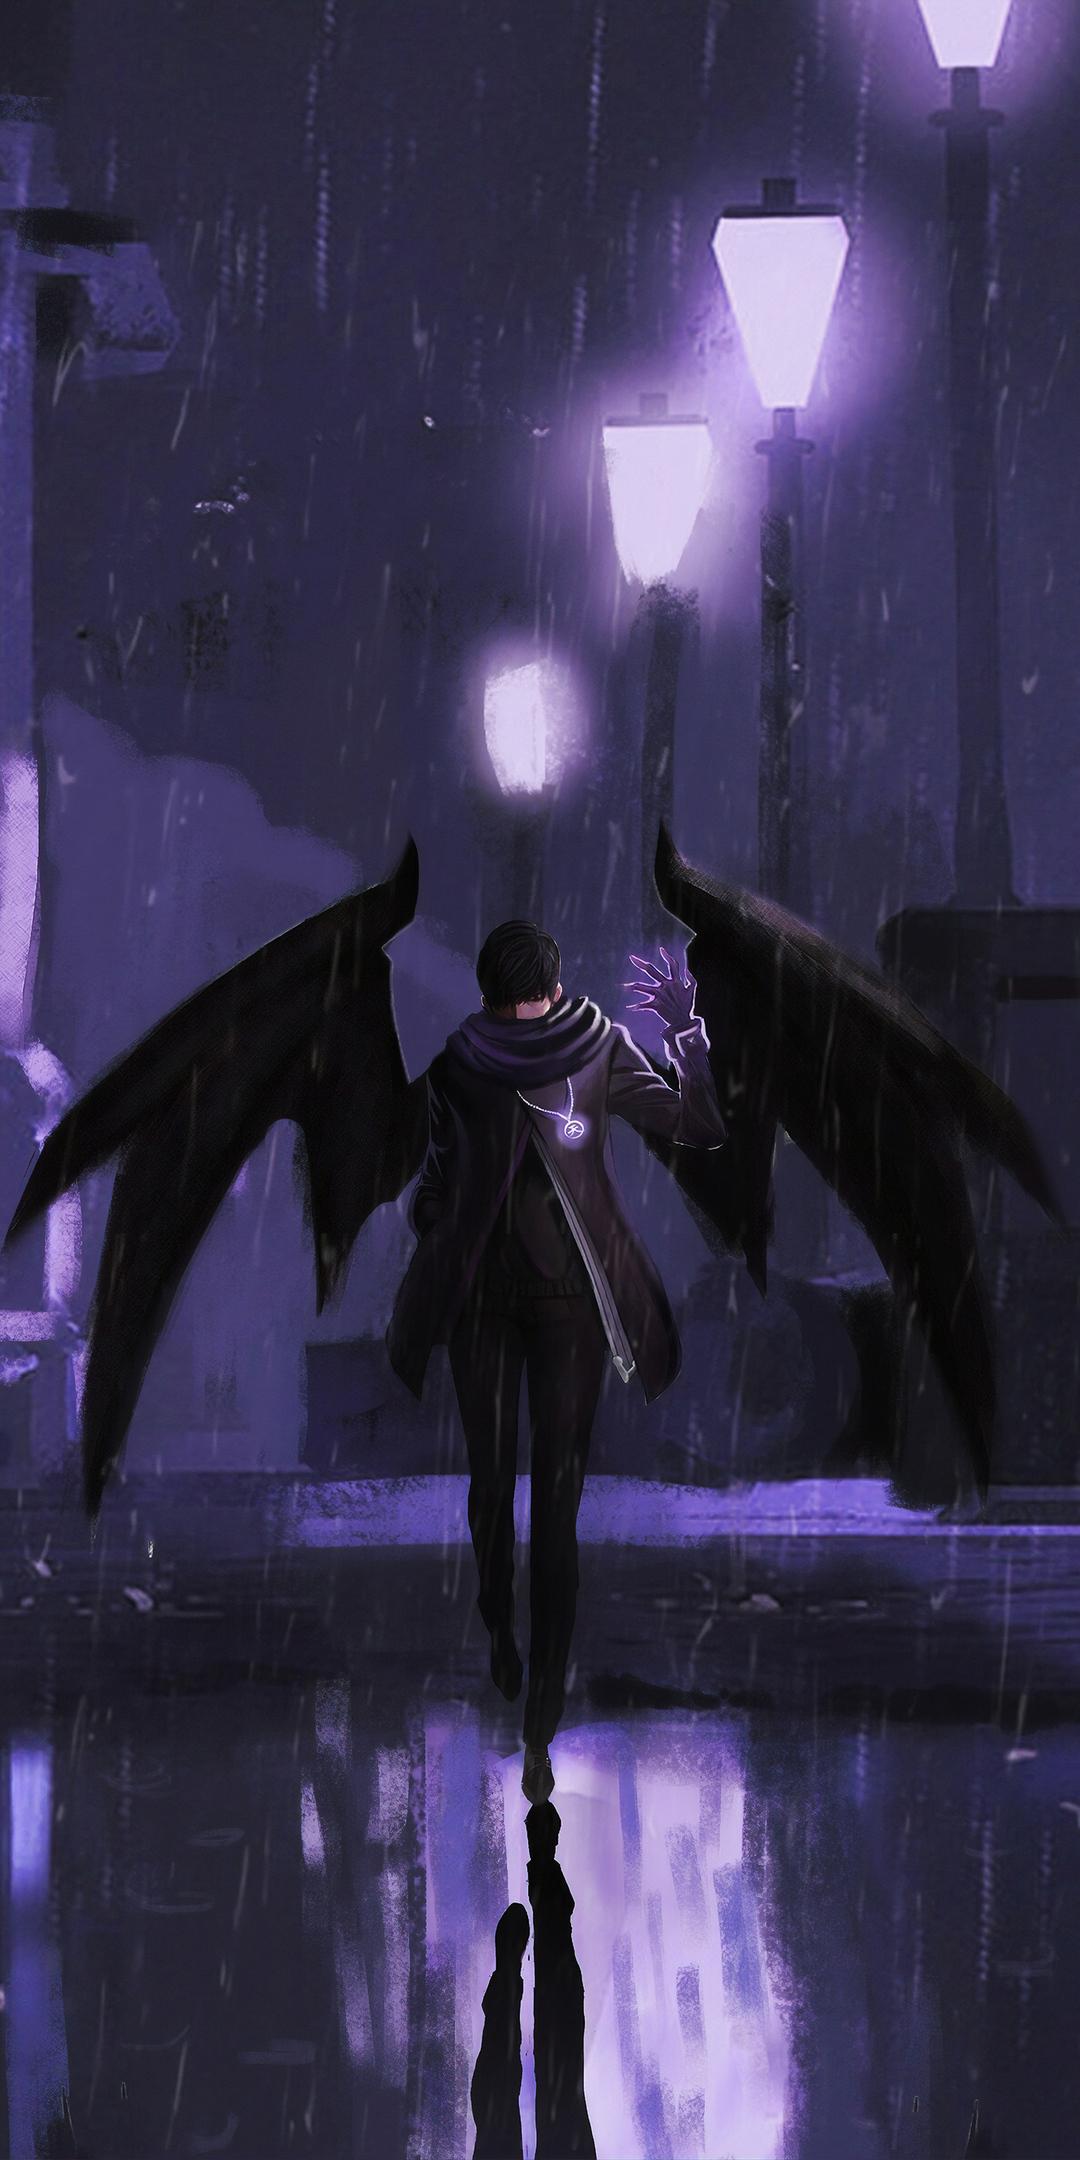 demon-character-with-wings-4k-va.jpg